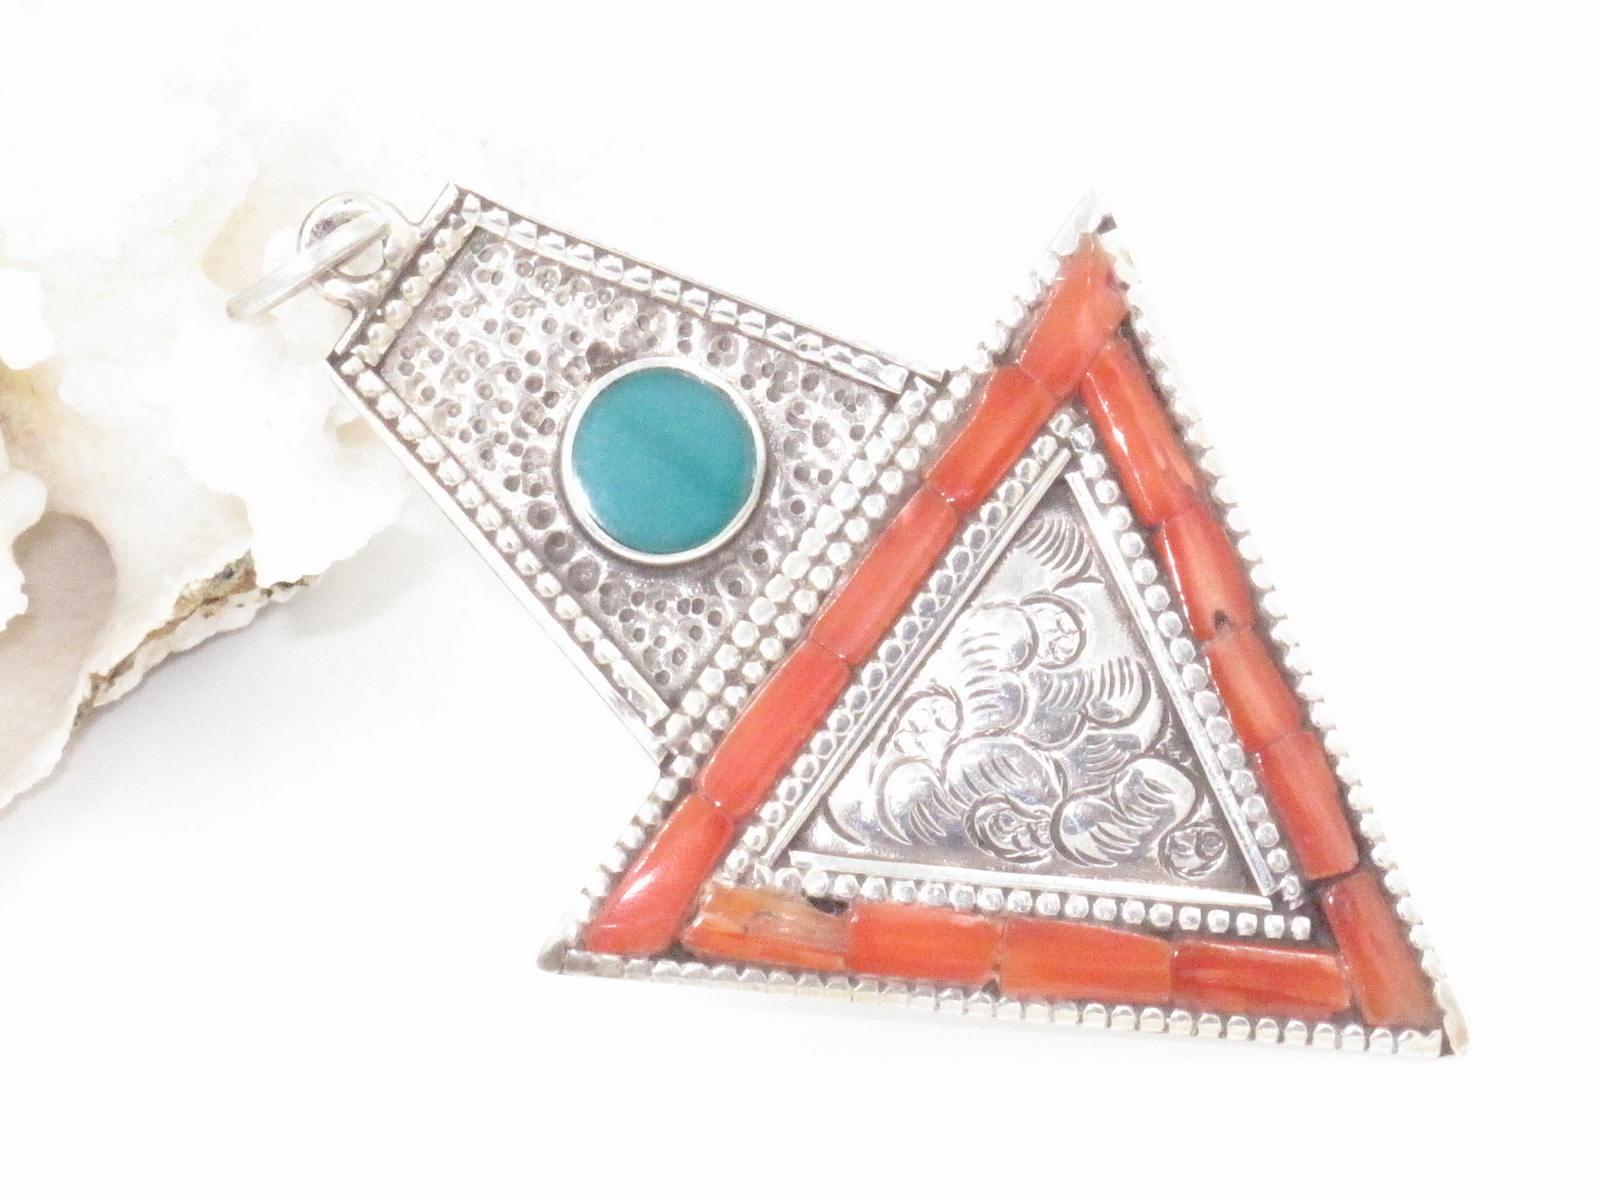 pendente tibetano argento corallo e turchese